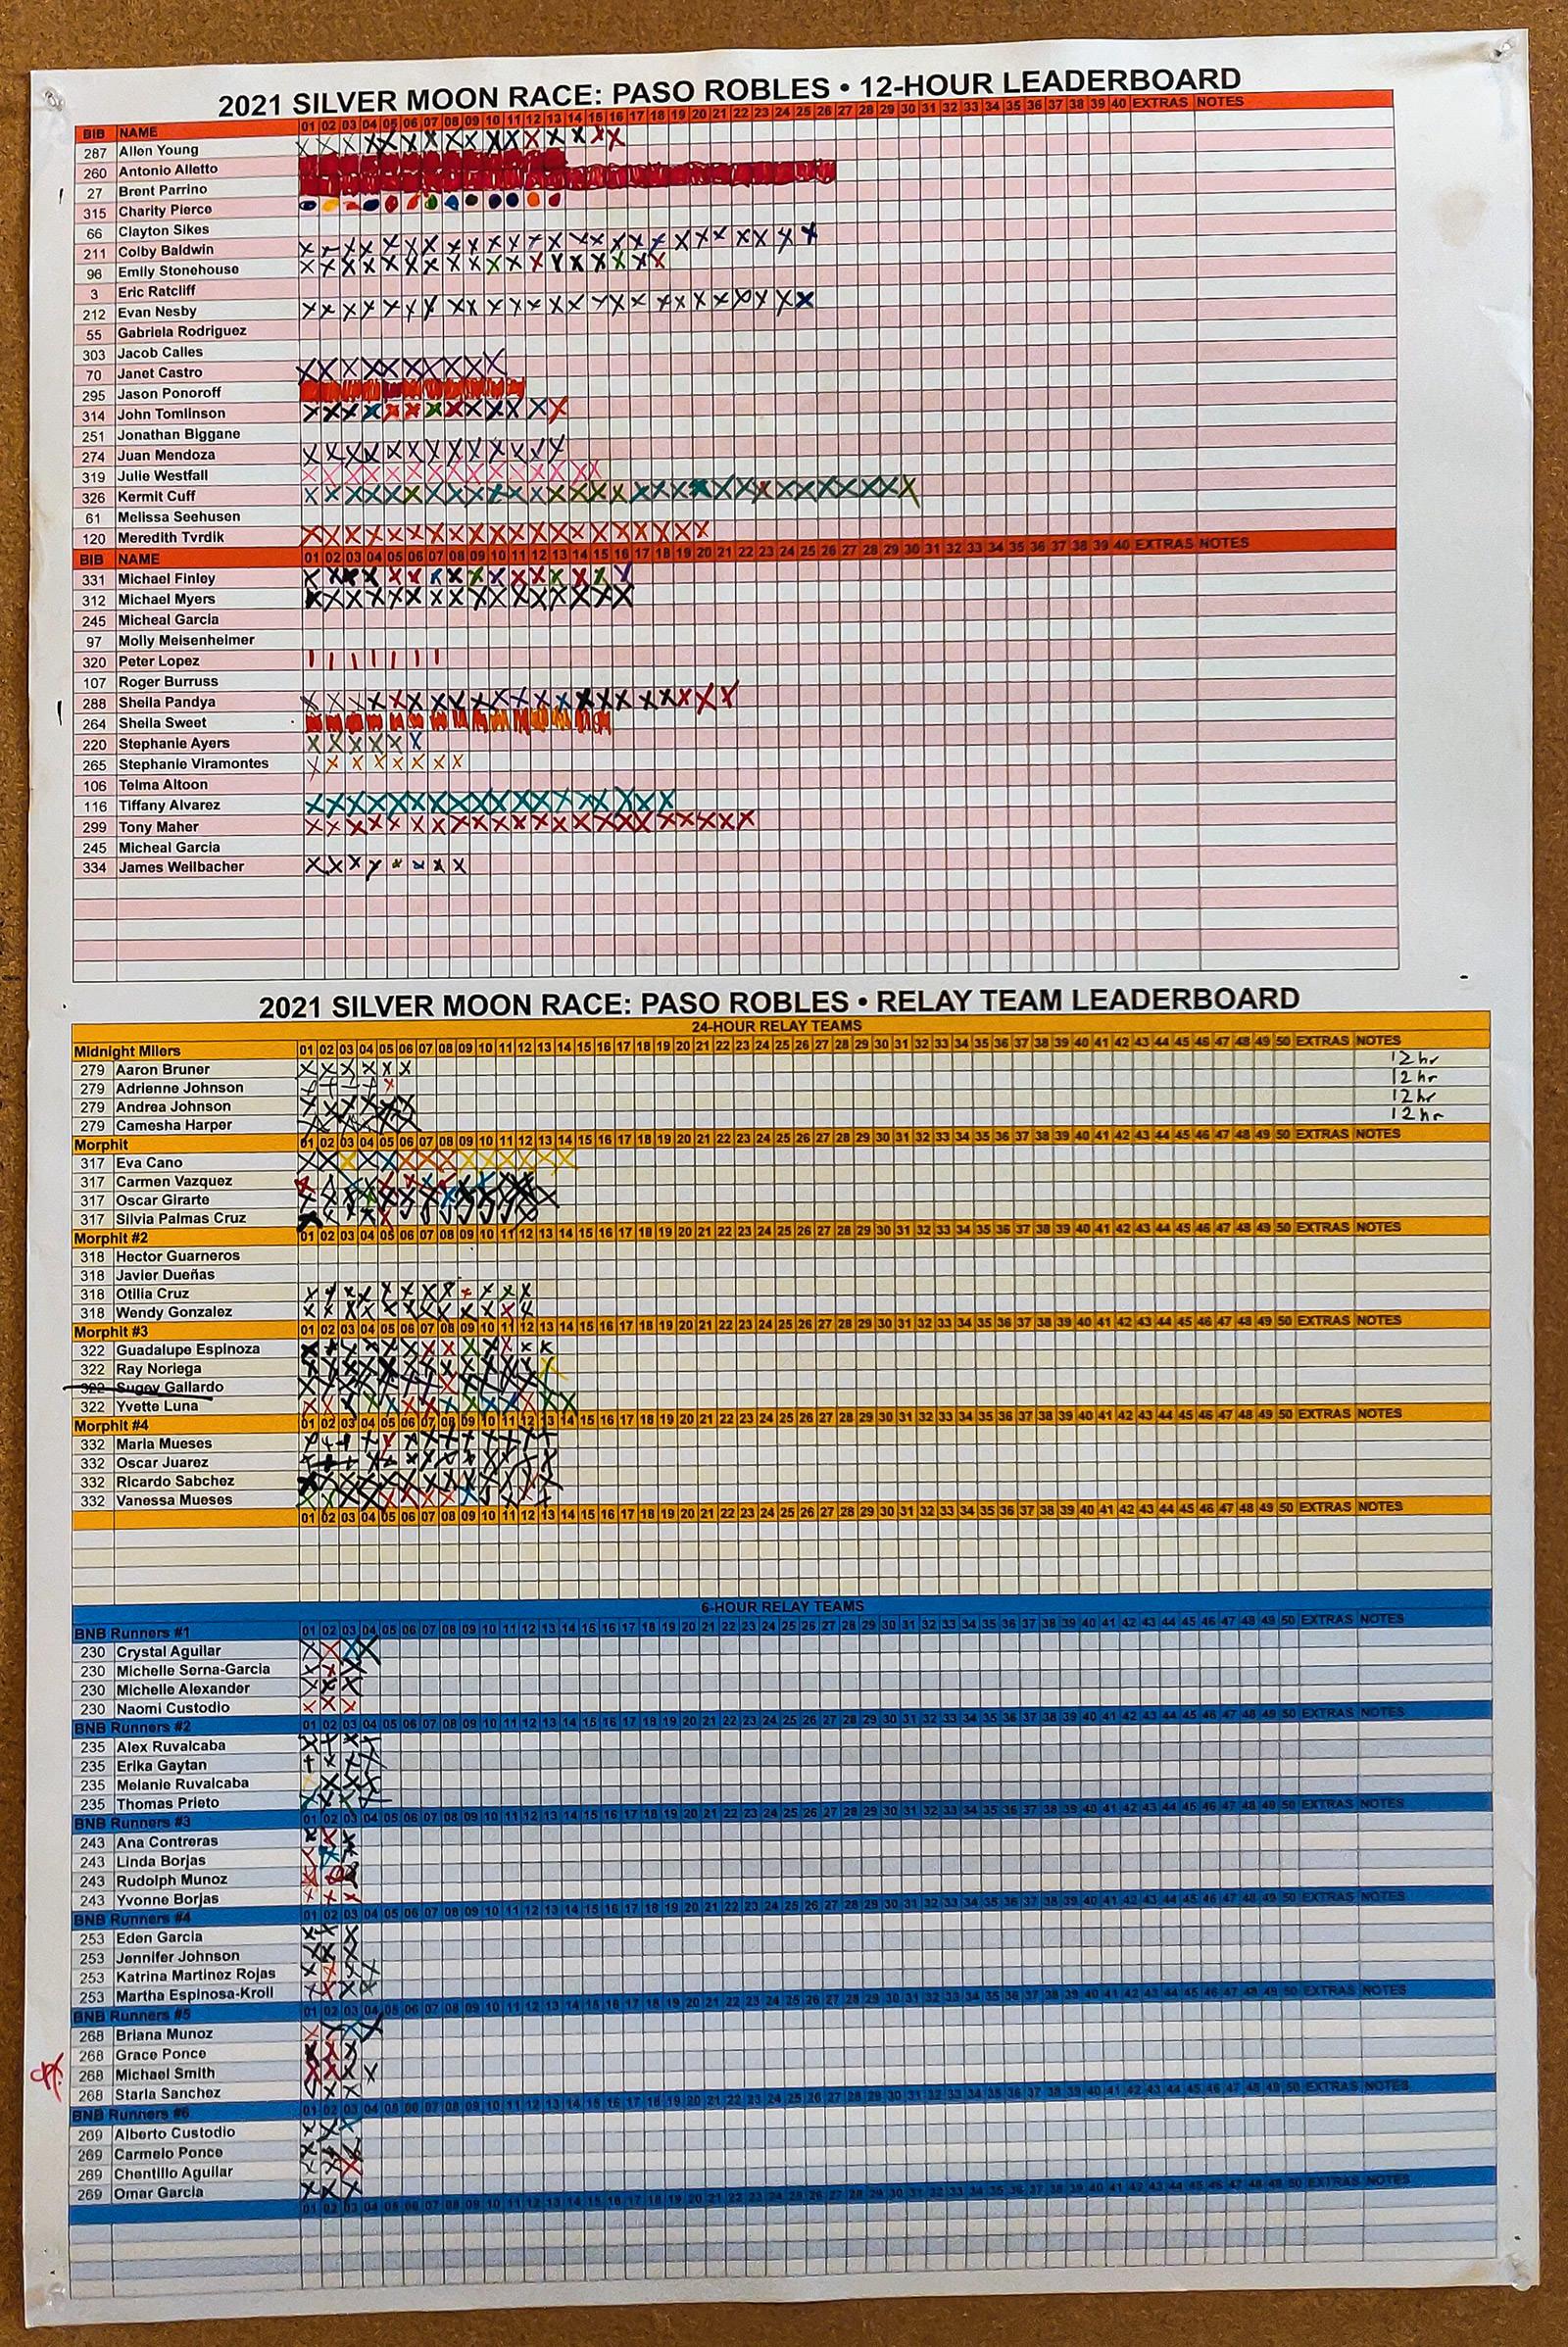 12-Hour & Relay Leaderboard